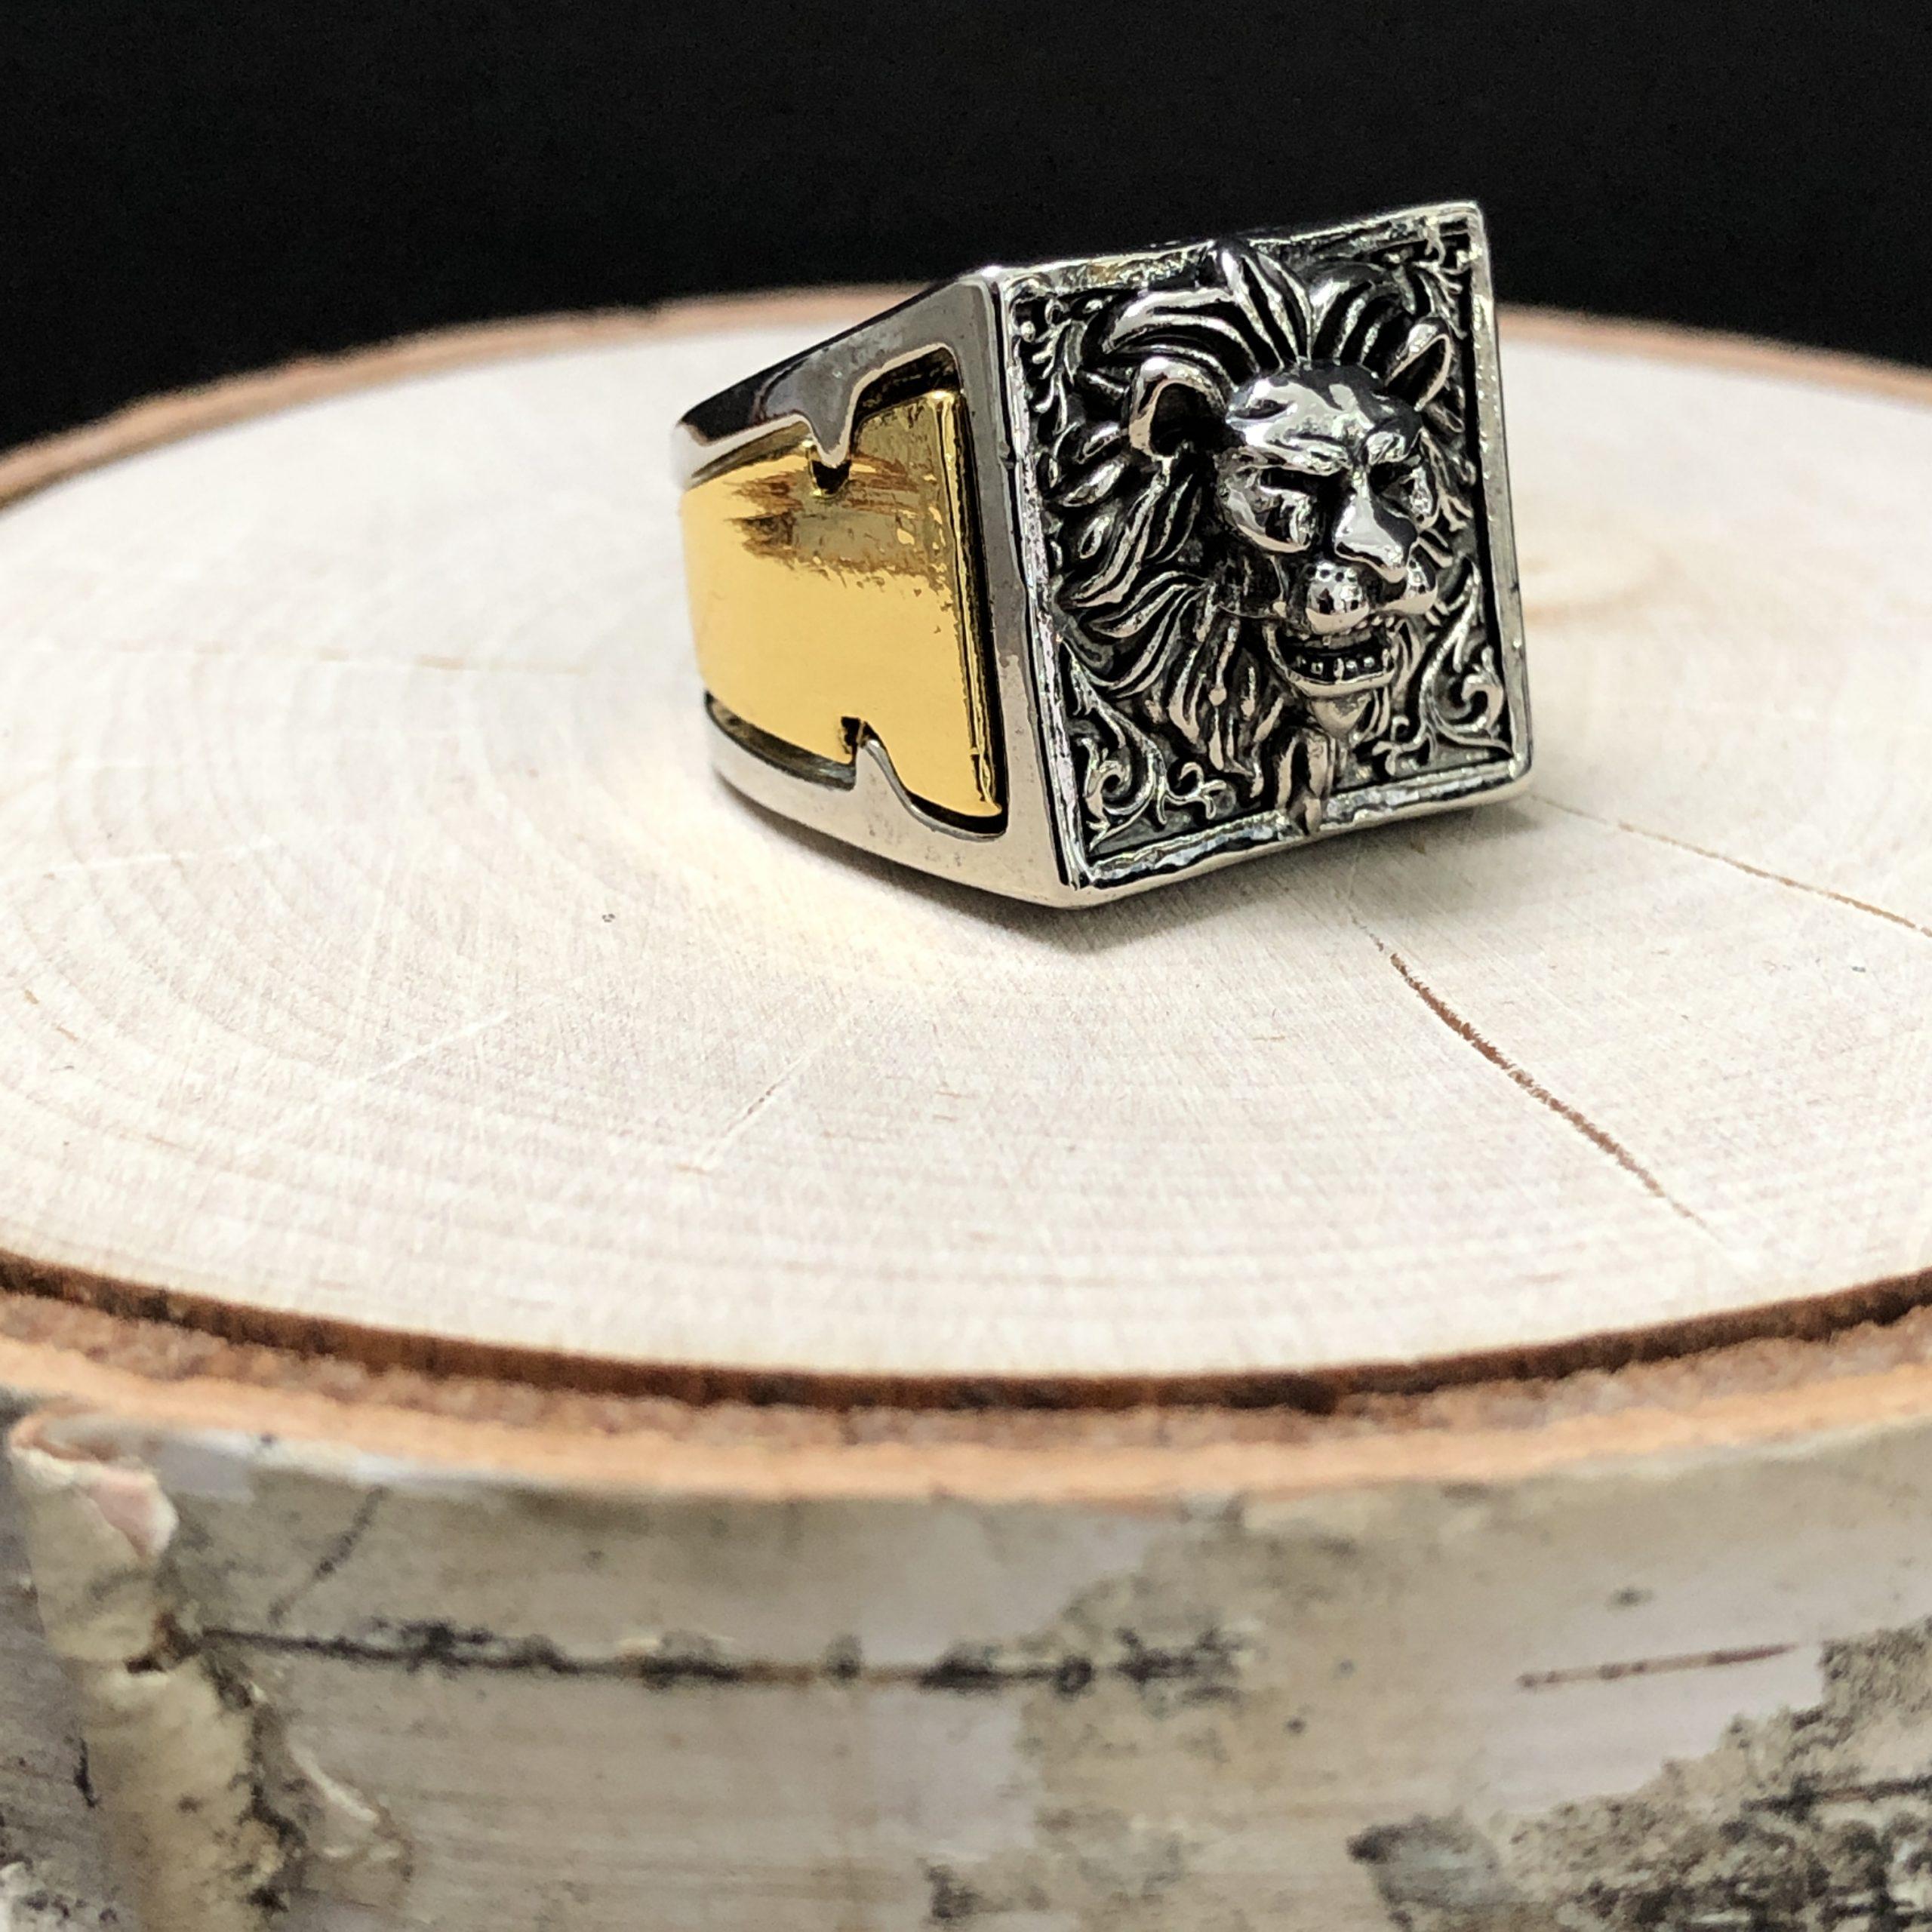 Lions Den ring